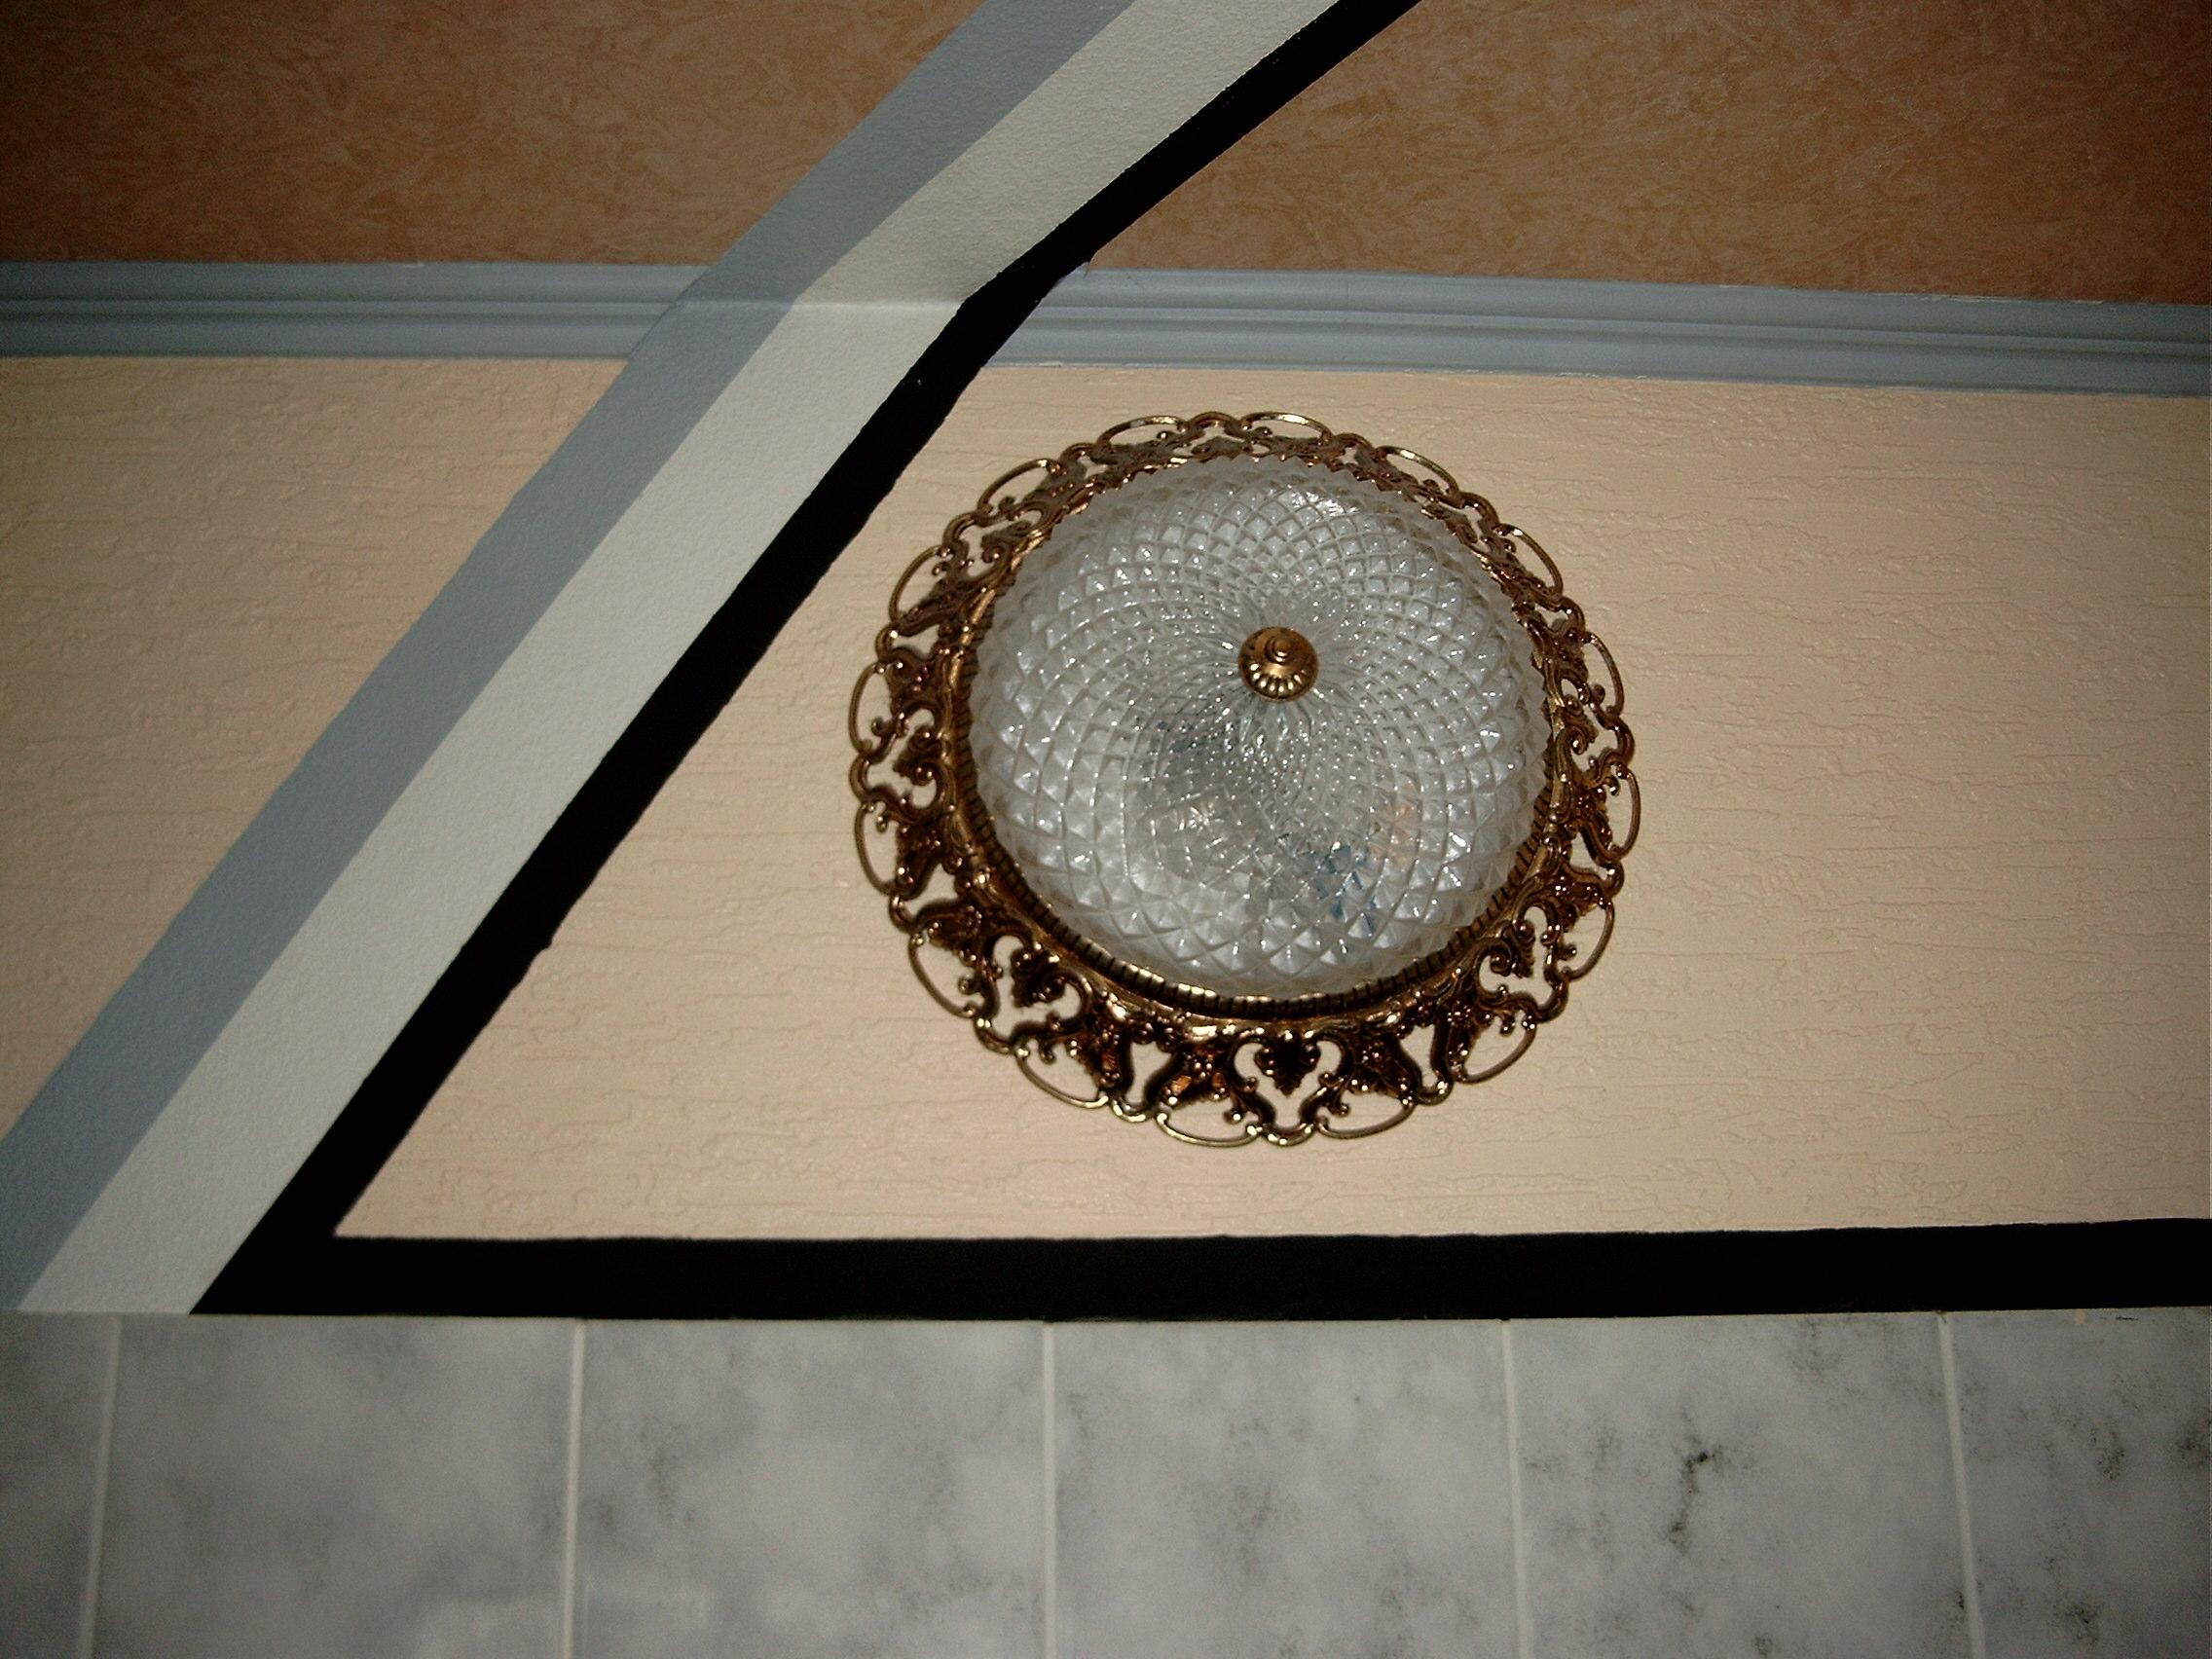 zielprofile und rosetten malerbetrieb farb u lackdesign k stinger. Black Bedroom Furniture Sets. Home Design Ideas